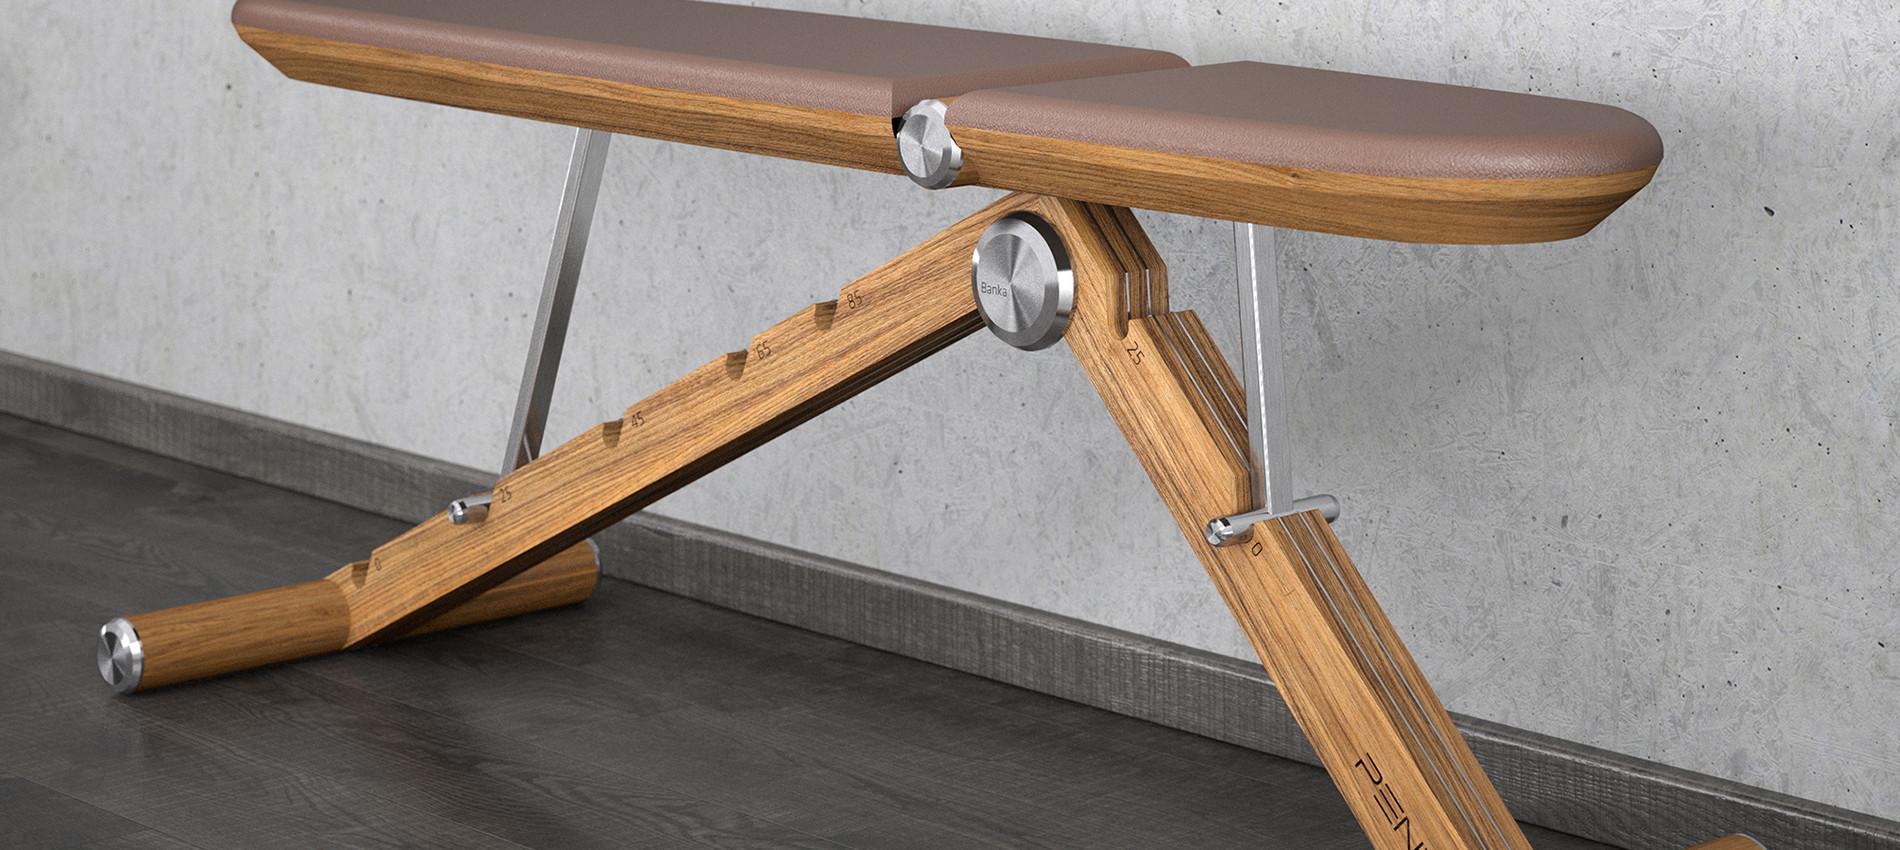 BANKA luxury weght bench home gym